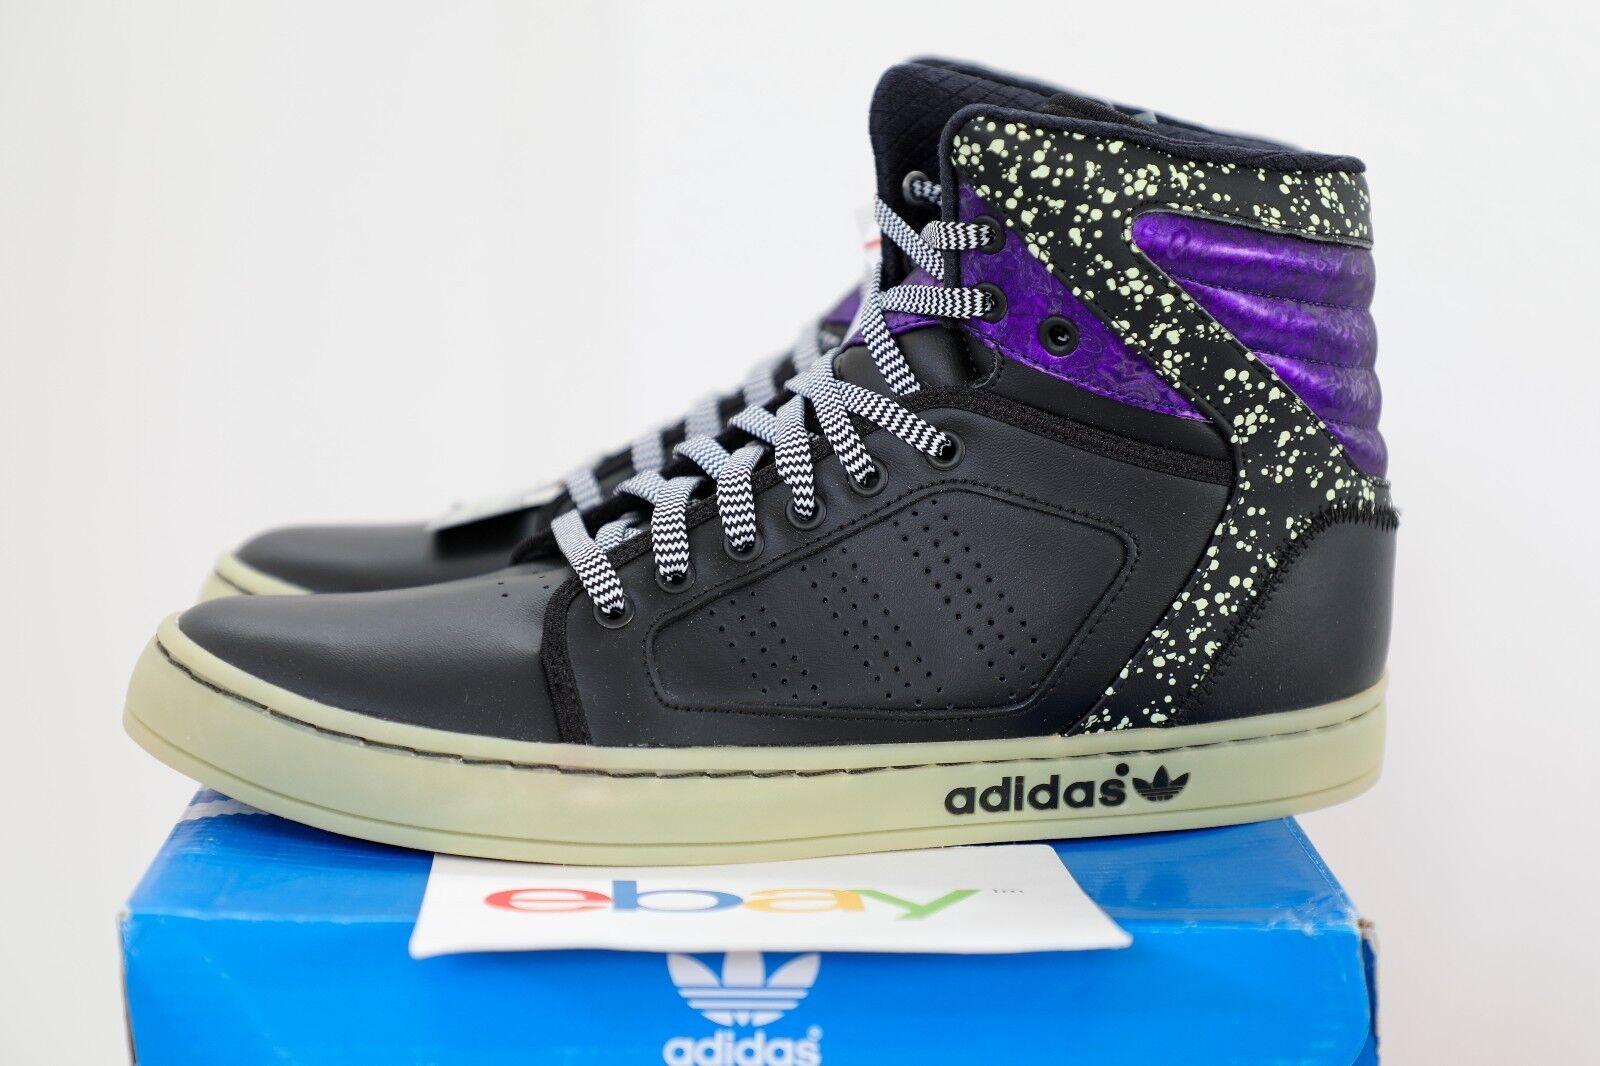 DS Adidas Adi High EXT GTID Sizes 10-13 Court Purple black glow in dark G66431